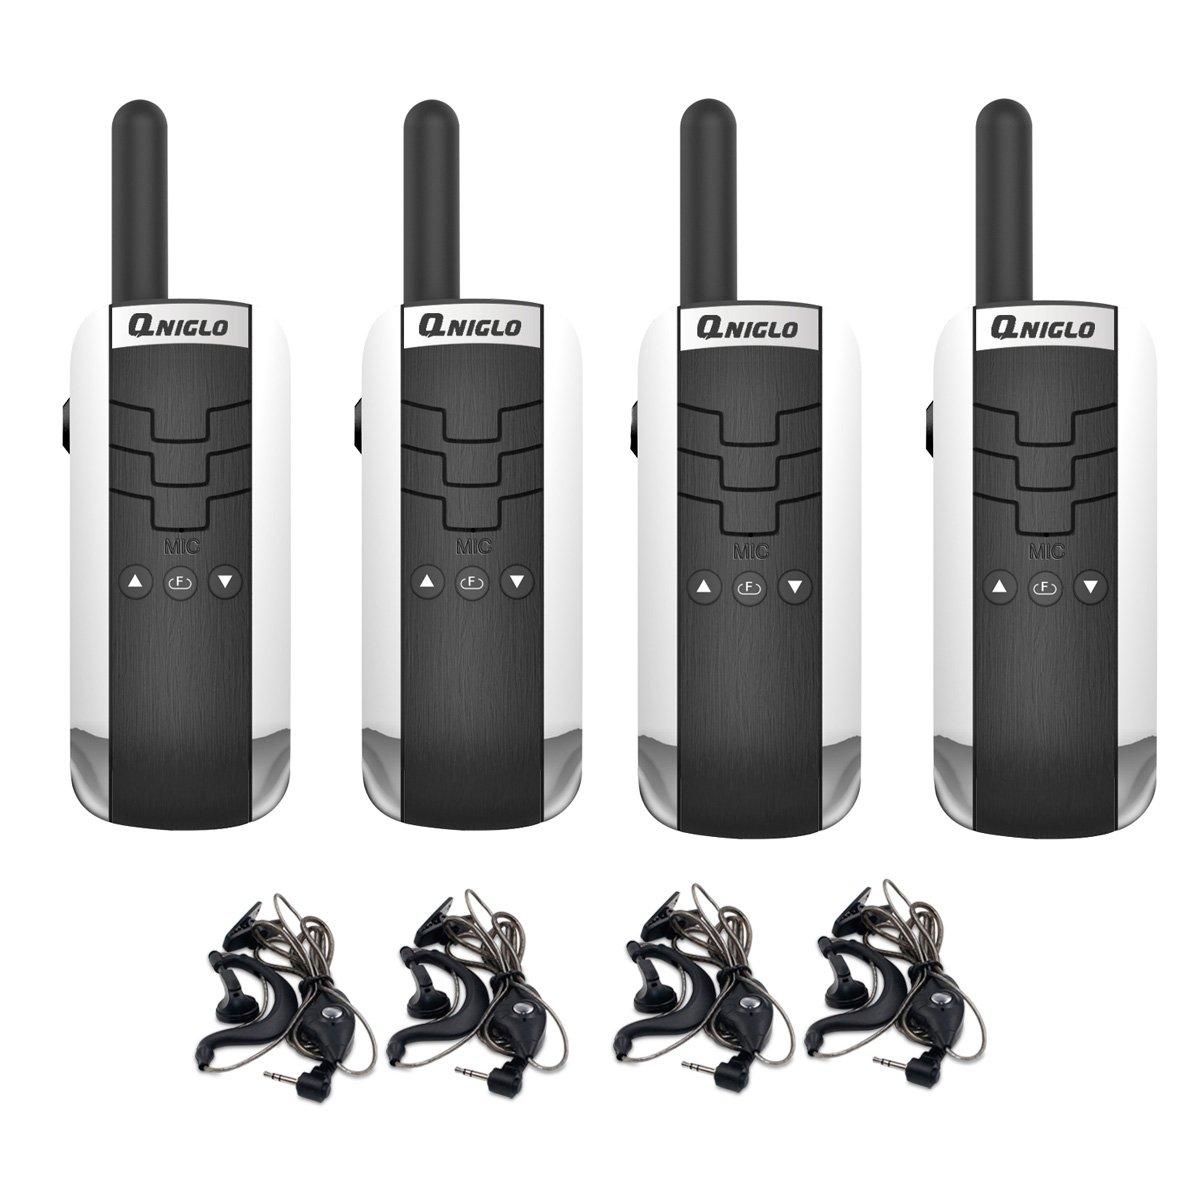 Eoncore Q311 Mini Walkie Talkie Two Ways Radio Toy GMRS Handheld Walkie Talkie for Kids Adults 3 Miles Long Range 16 Channels (4 Pack)